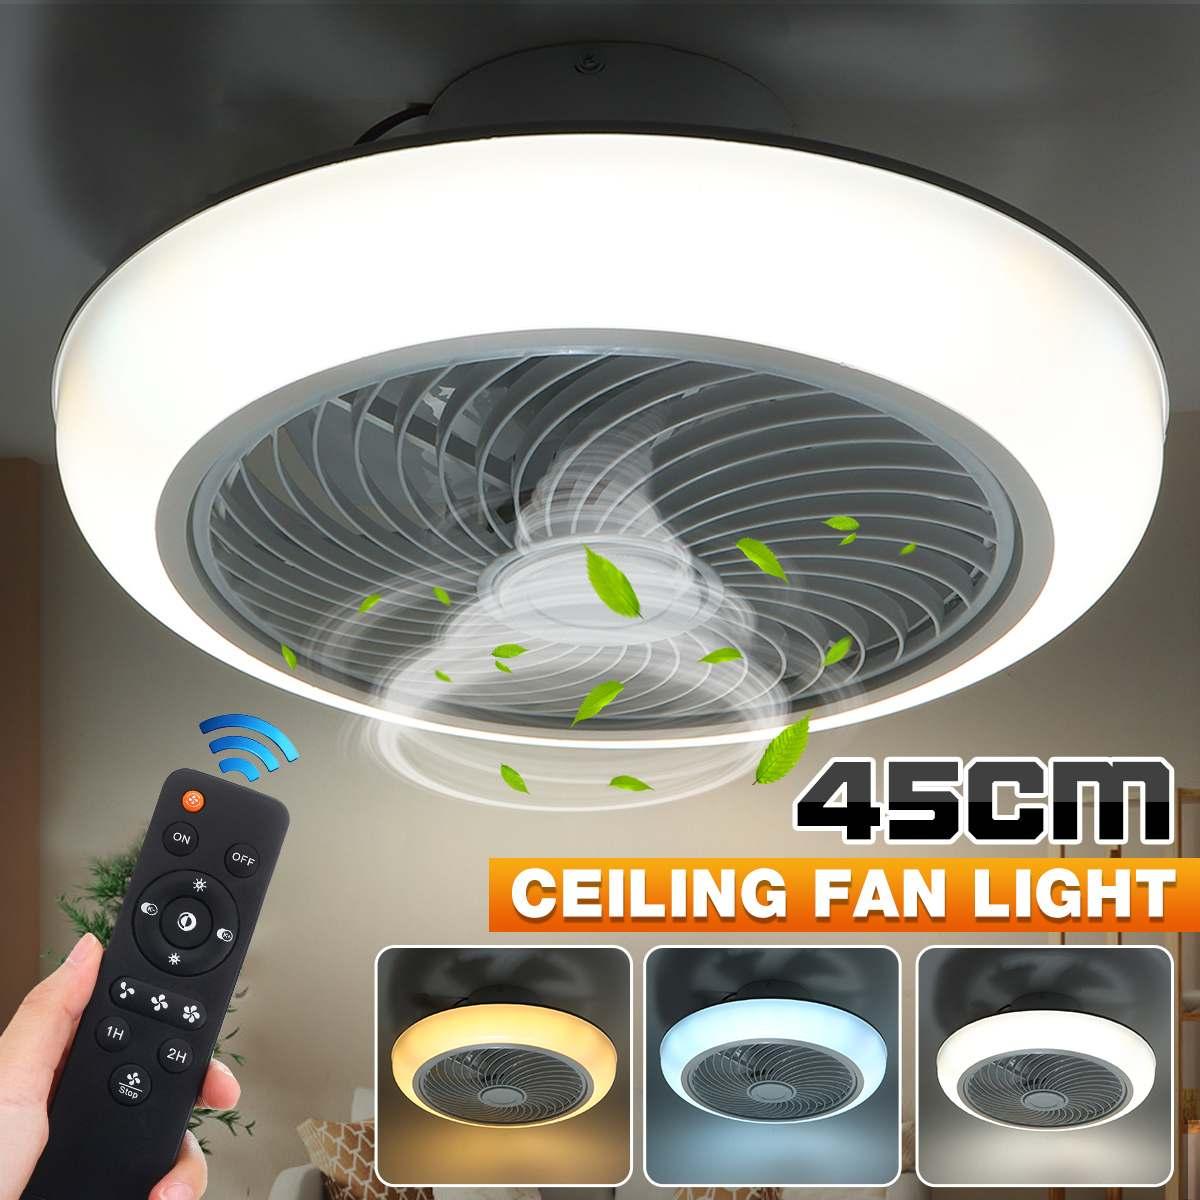 36W/72W 110V/220V 45 سنتيمتر عكس الضوء LED السقف مروحة ضوء التحكم عن بعد مروحة مع الإضاءة قابل للتعديل سرعة الرياح LED الهواء برودة مصباح